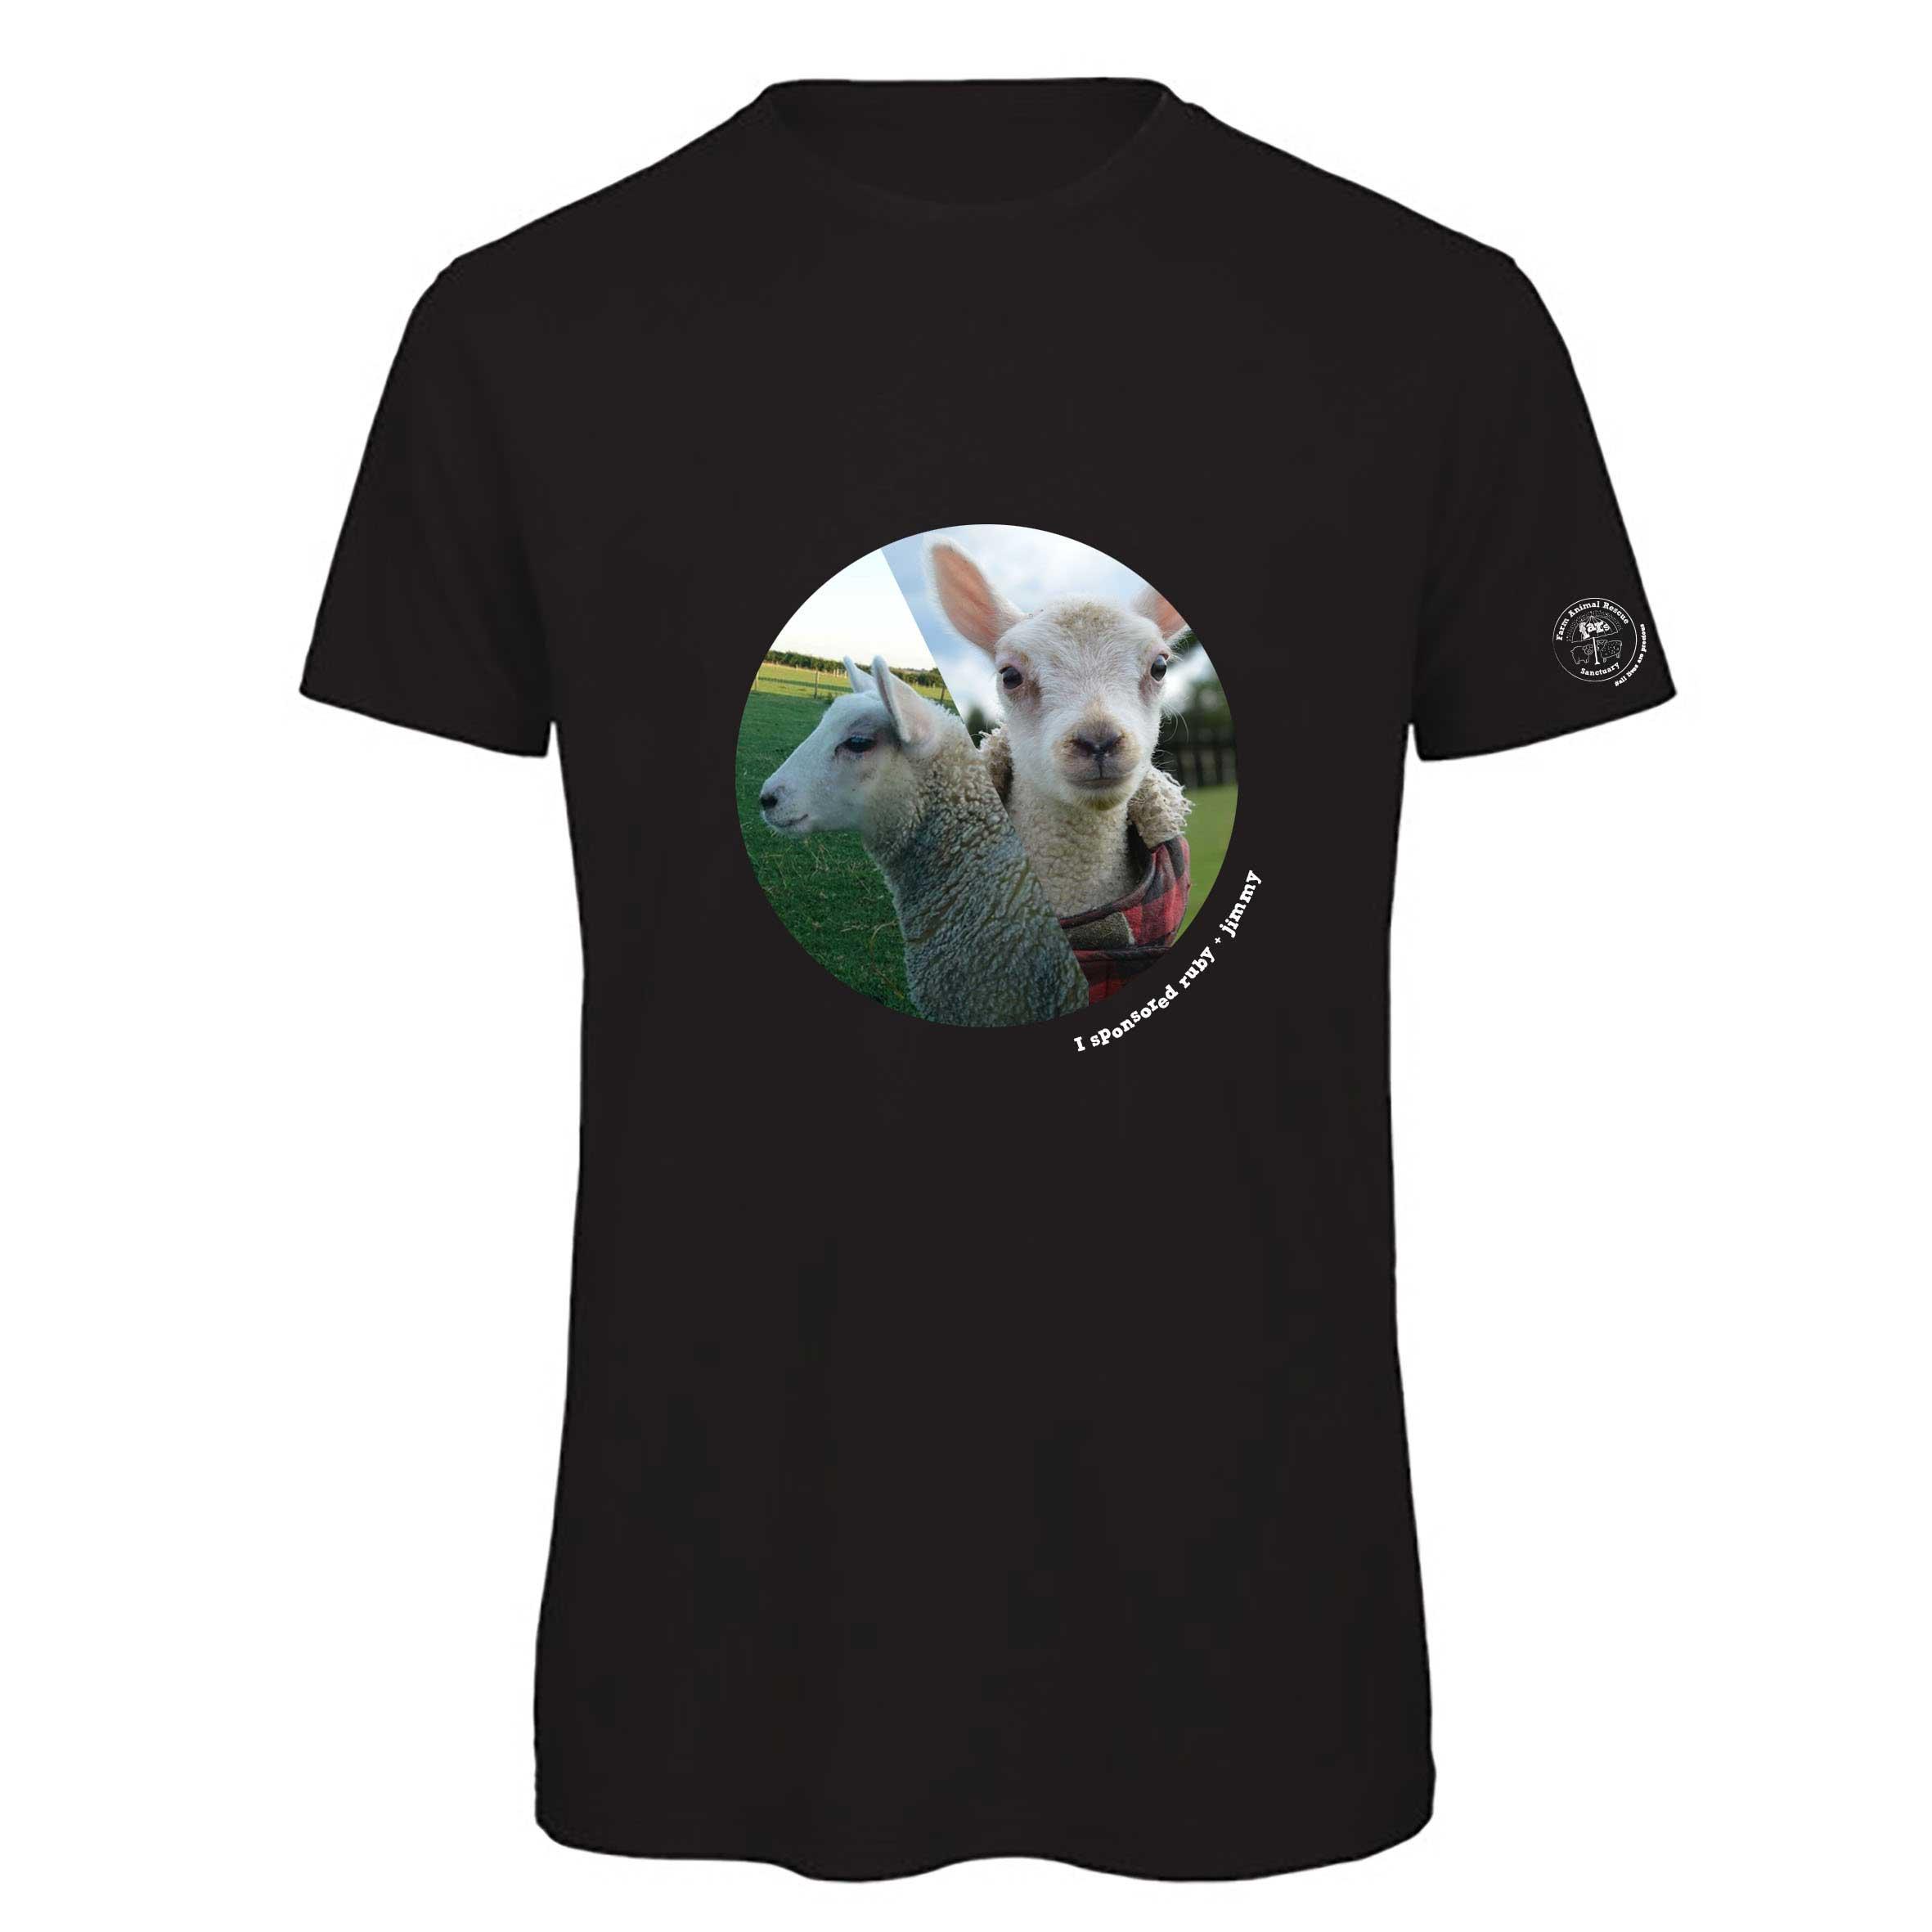 FARS Sponsorship tshirt with Ruby and Jimmy